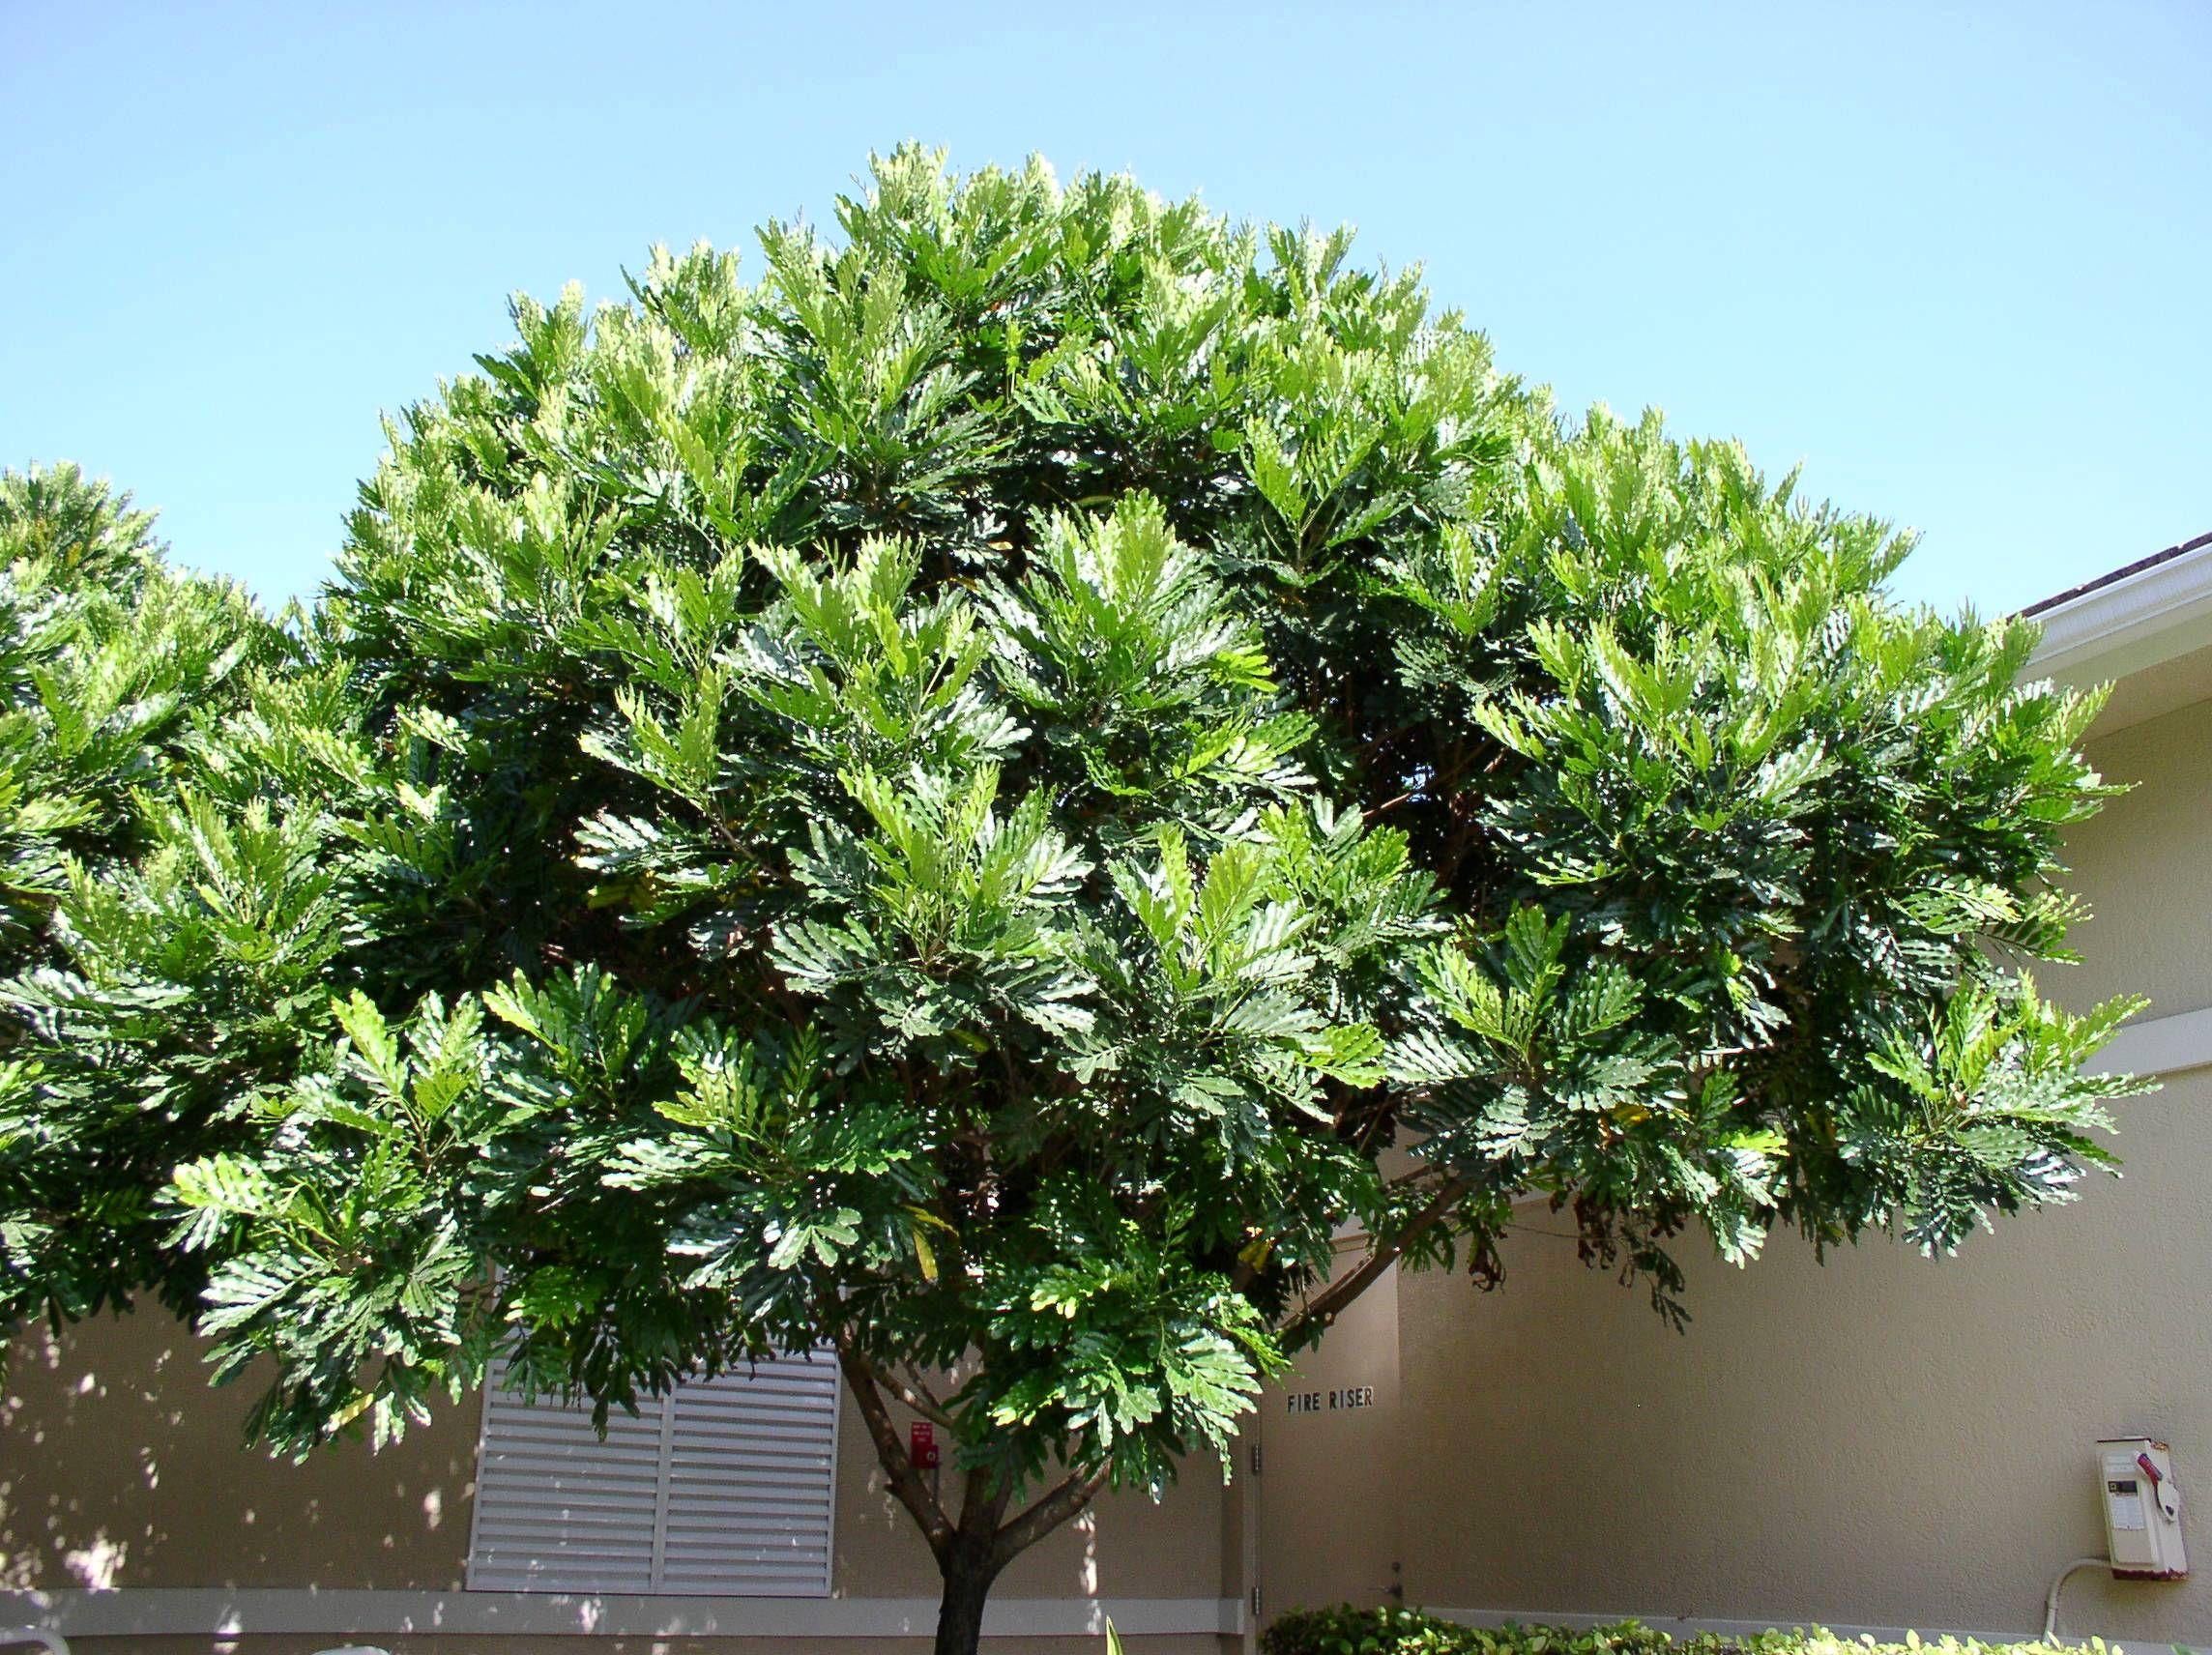 Japanese Fern Tree Outside The Fitness Center In Jonathan